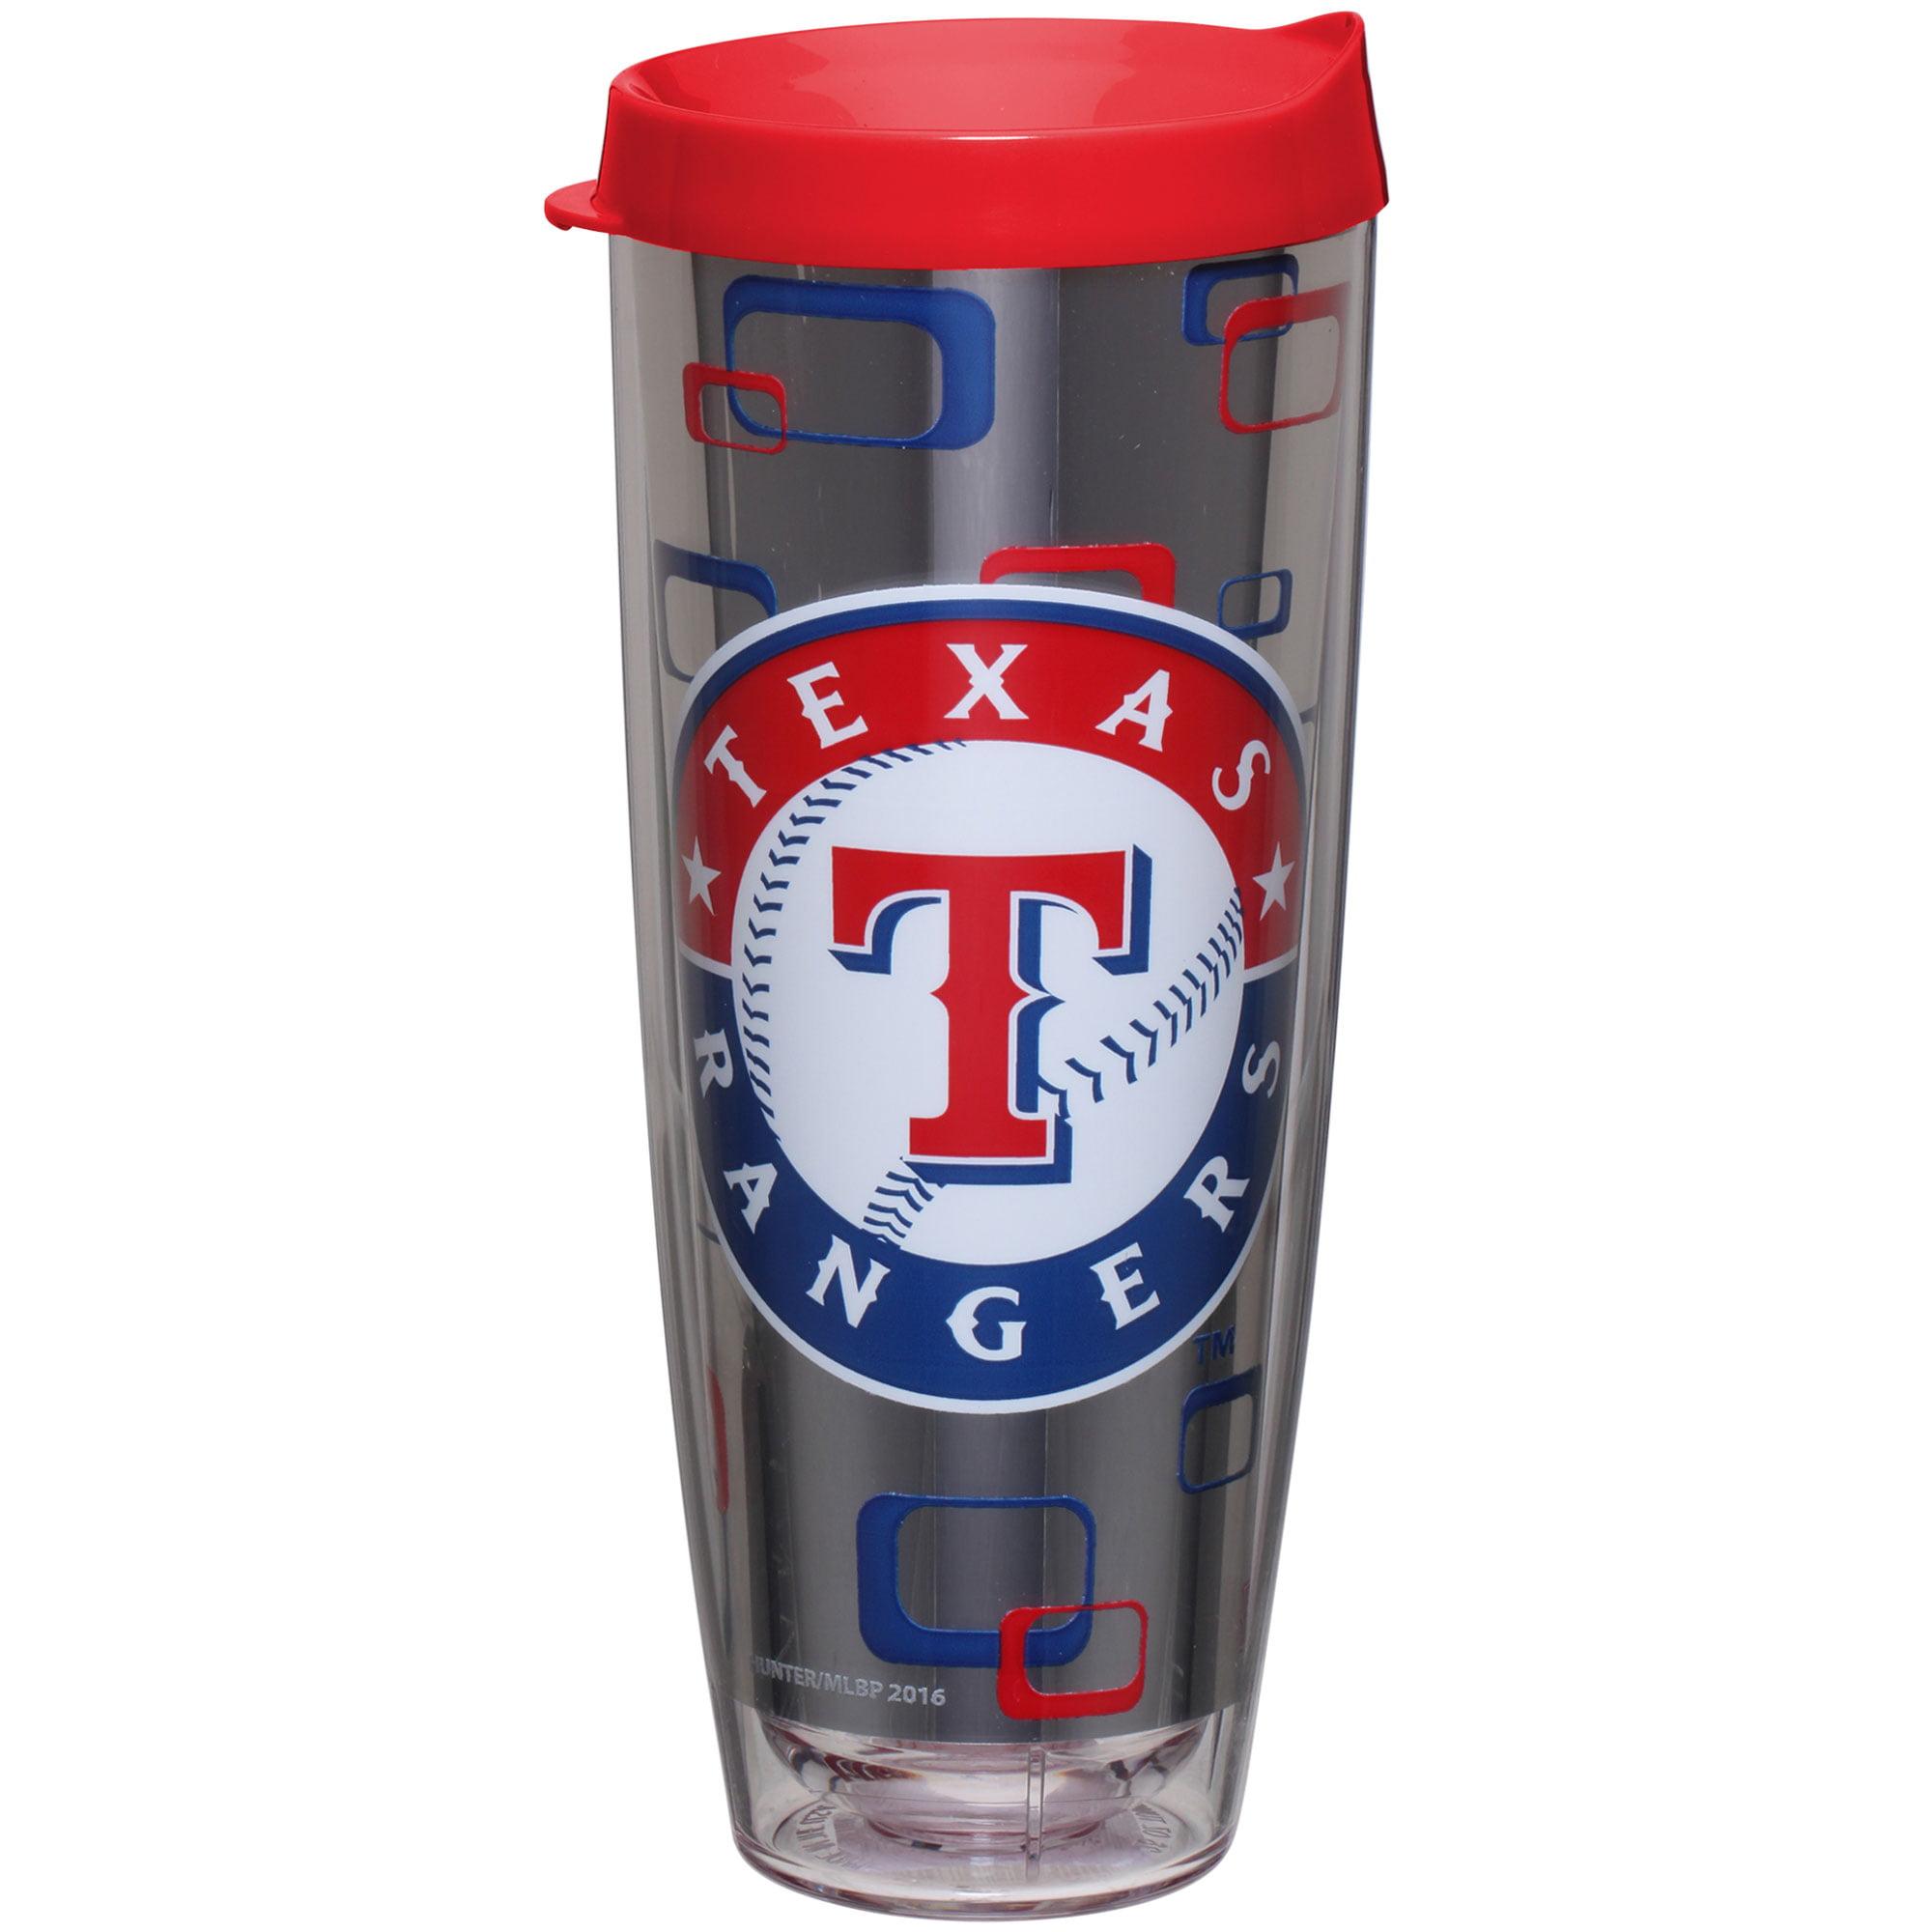 Texas Rangers 26oz. Tritan Foil Wrap Tumbler - No Size